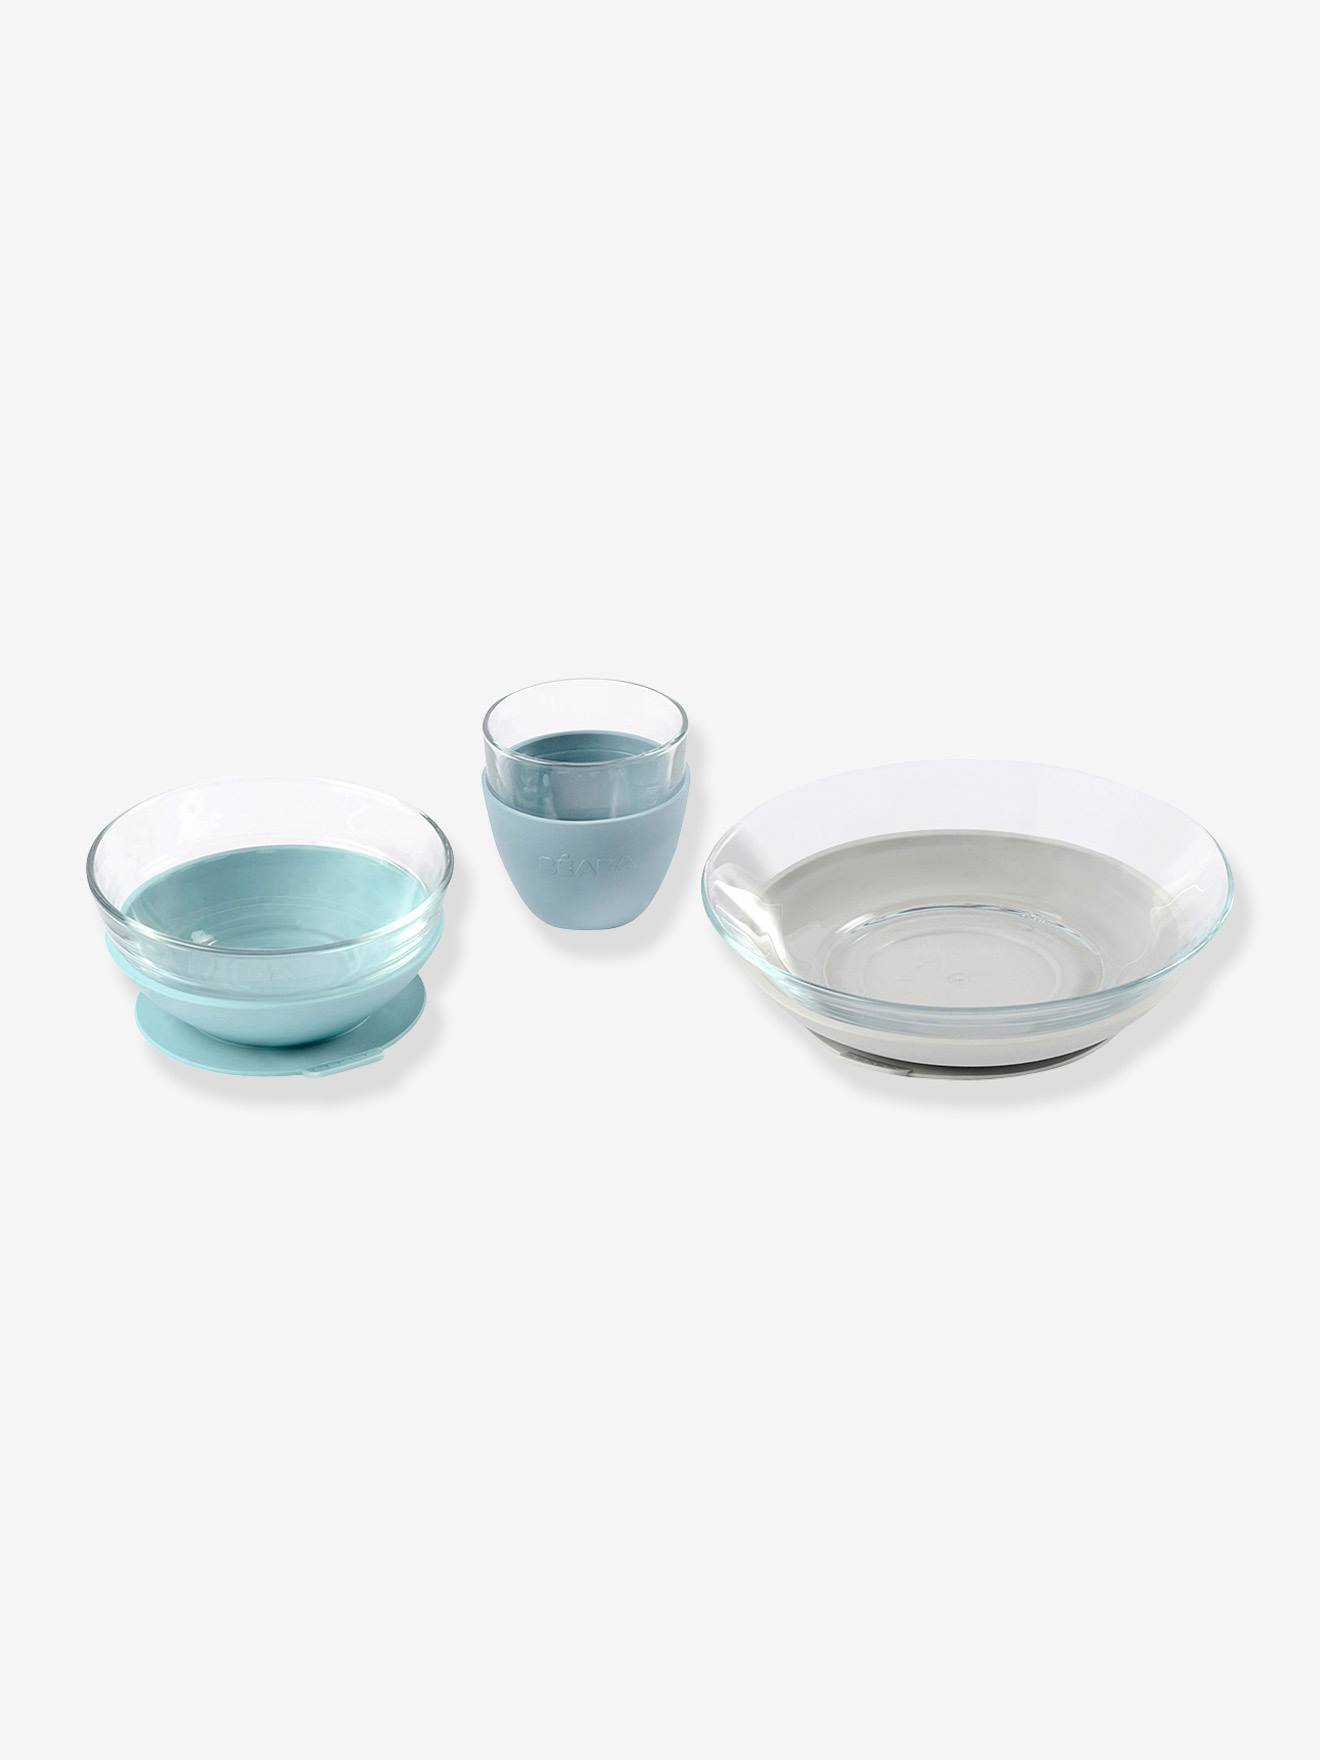 Coffret repas en verre BEABA X DURALEX bleu